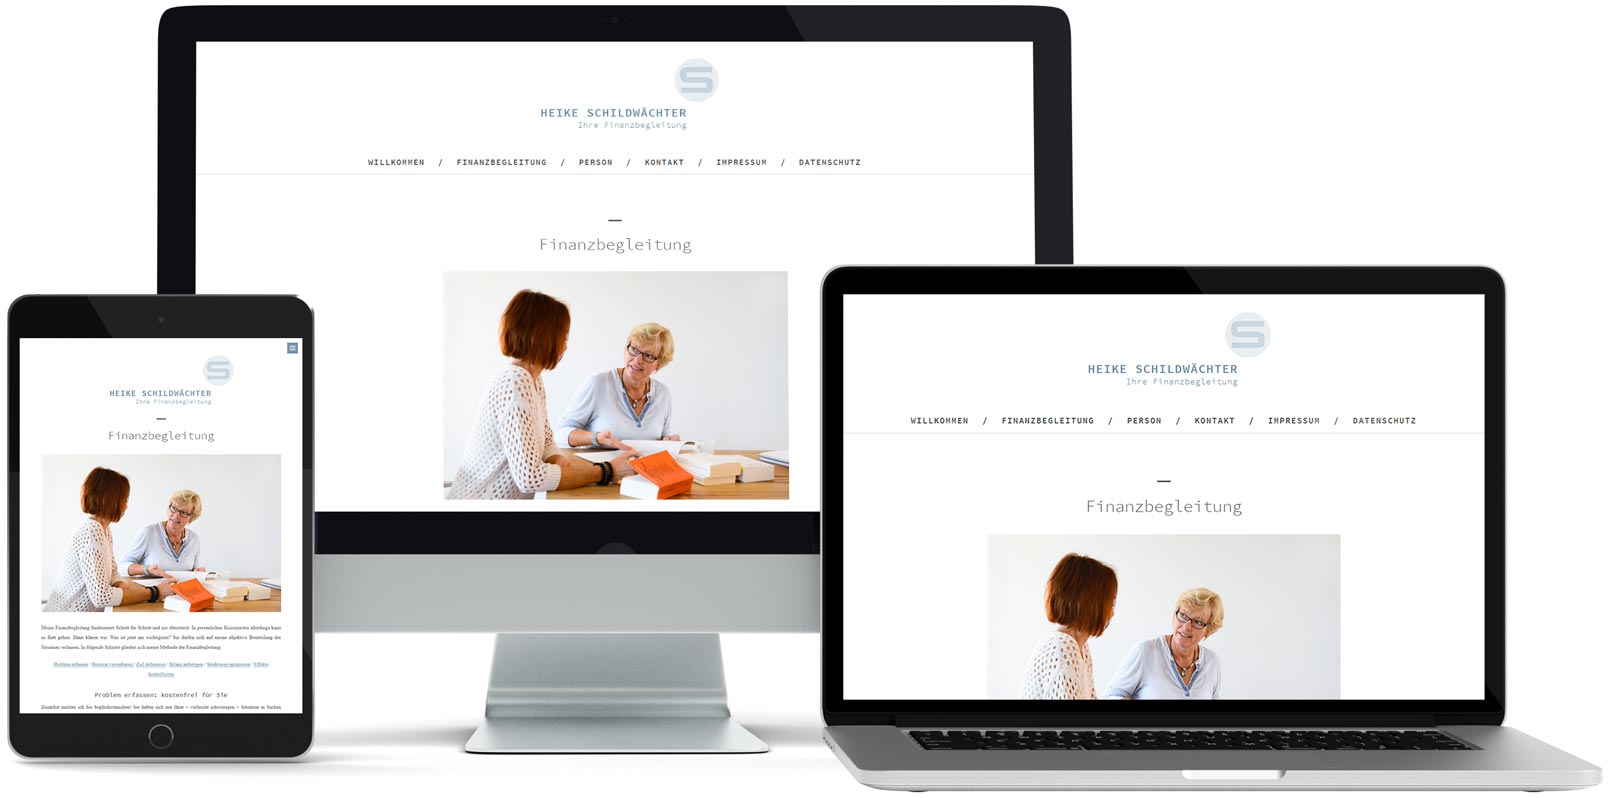 WordPress Webdesign: Heike Schildwächter